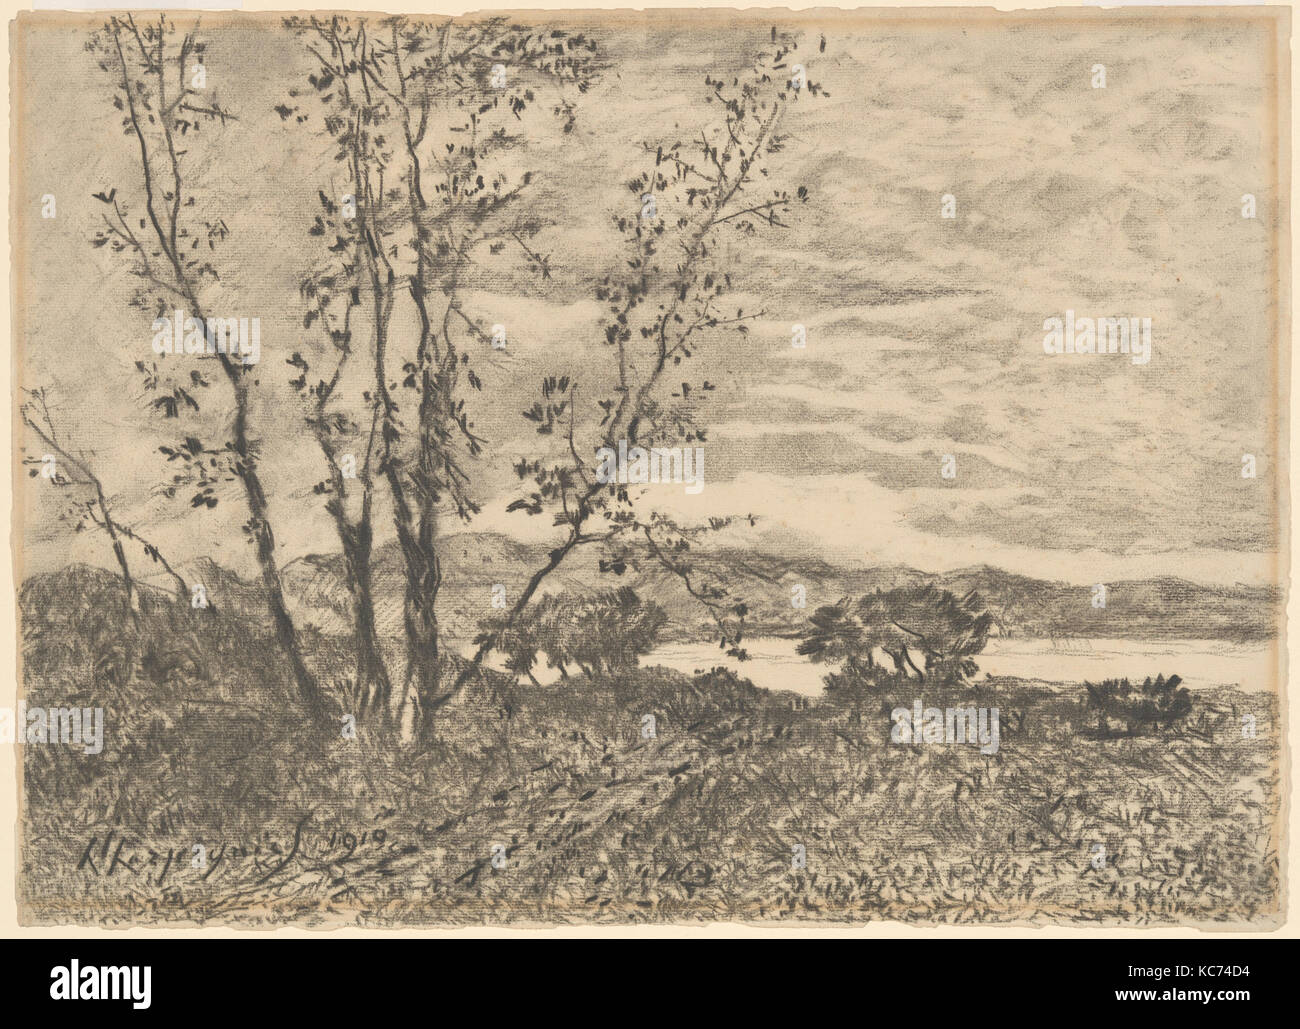 Le Cap Martin, 1910, Charcoal on laid paper, 15 1/4 x 21 1/16 in. (38.7 x 53.5 cm), Drawings, Henri-Joseph Harpignies - Stock Image